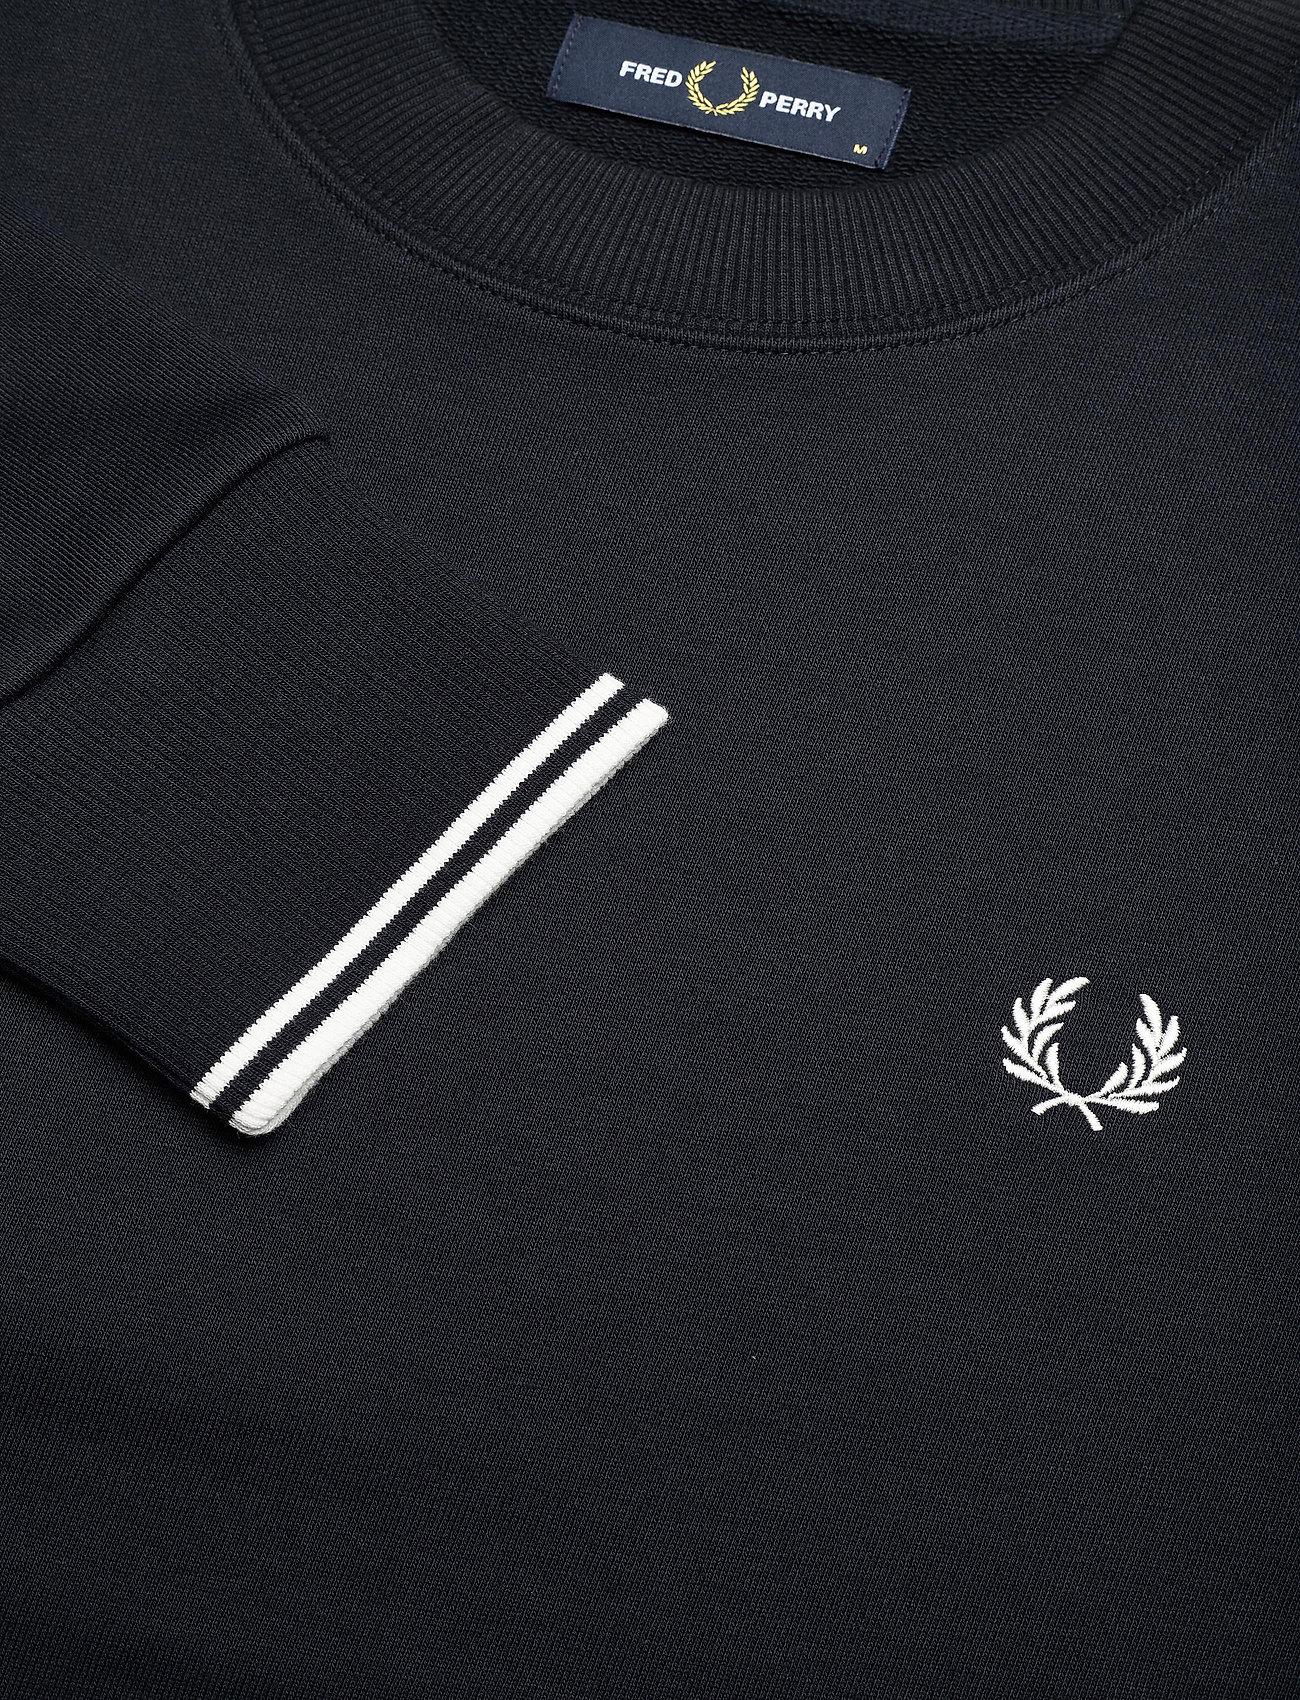 Fred Perry CREW NECK SWEATSHIRT - Sweatshirts NAVY - Menn Klær